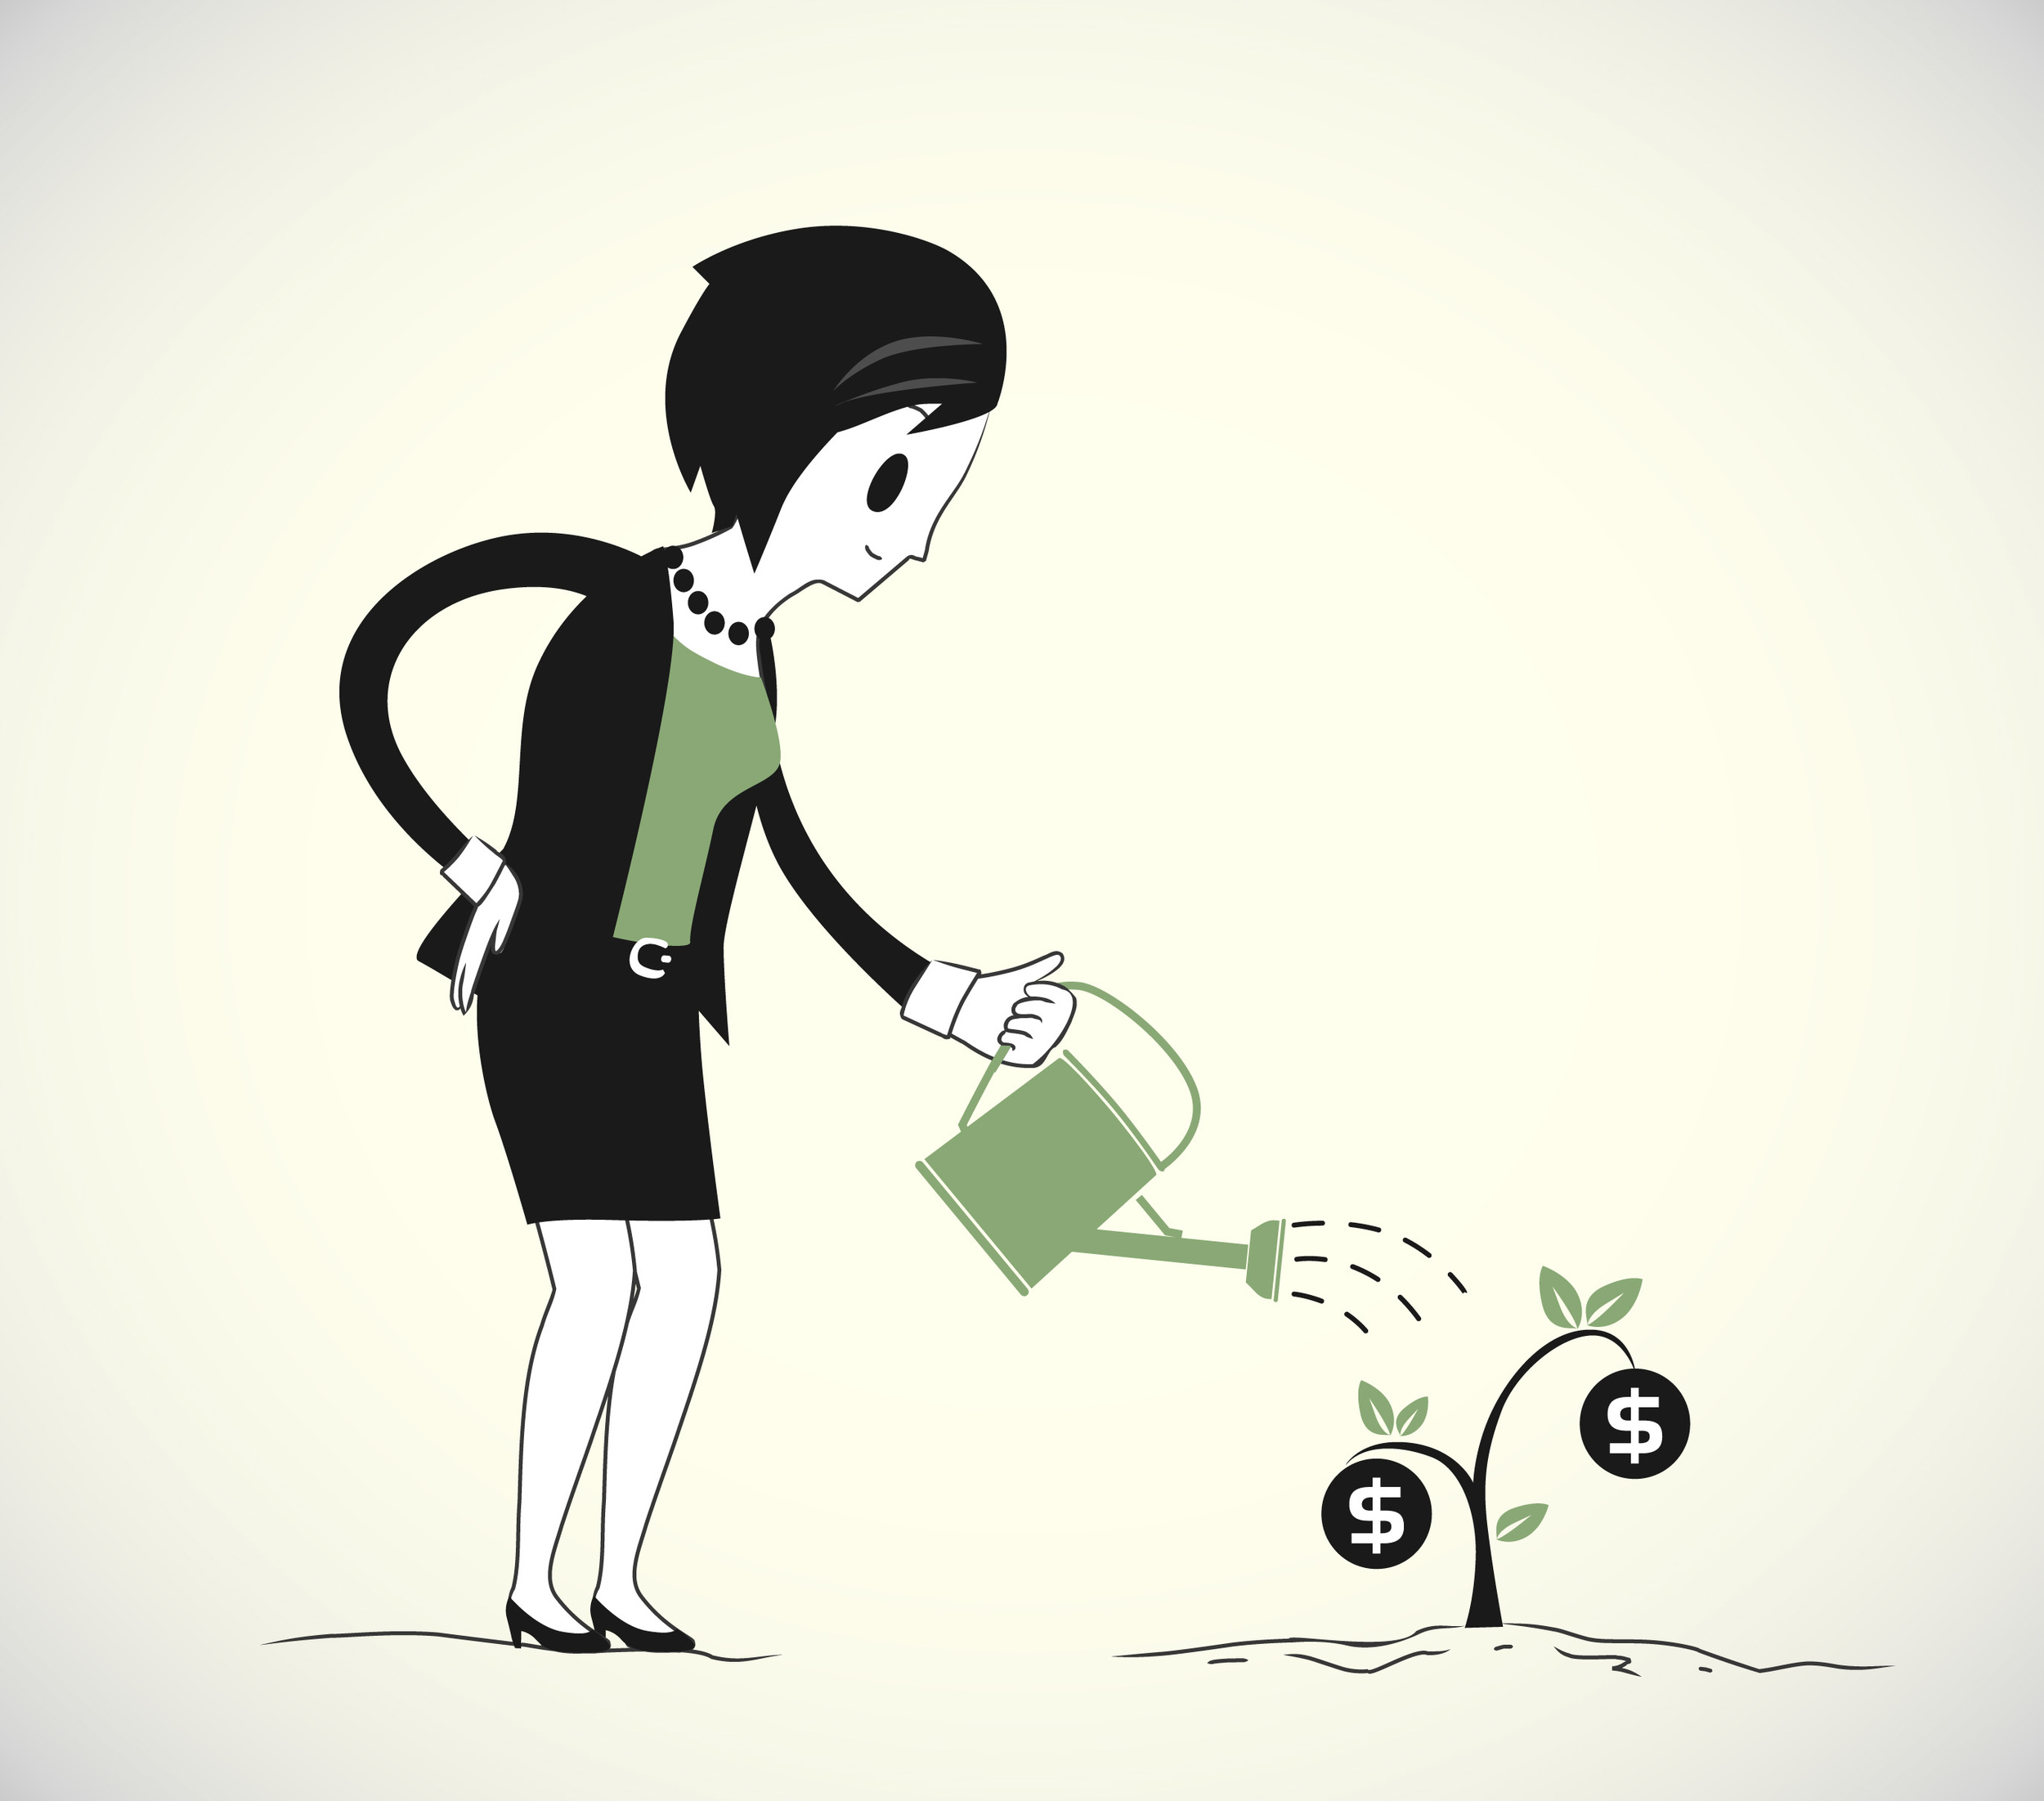 Resolve Financial Concerns